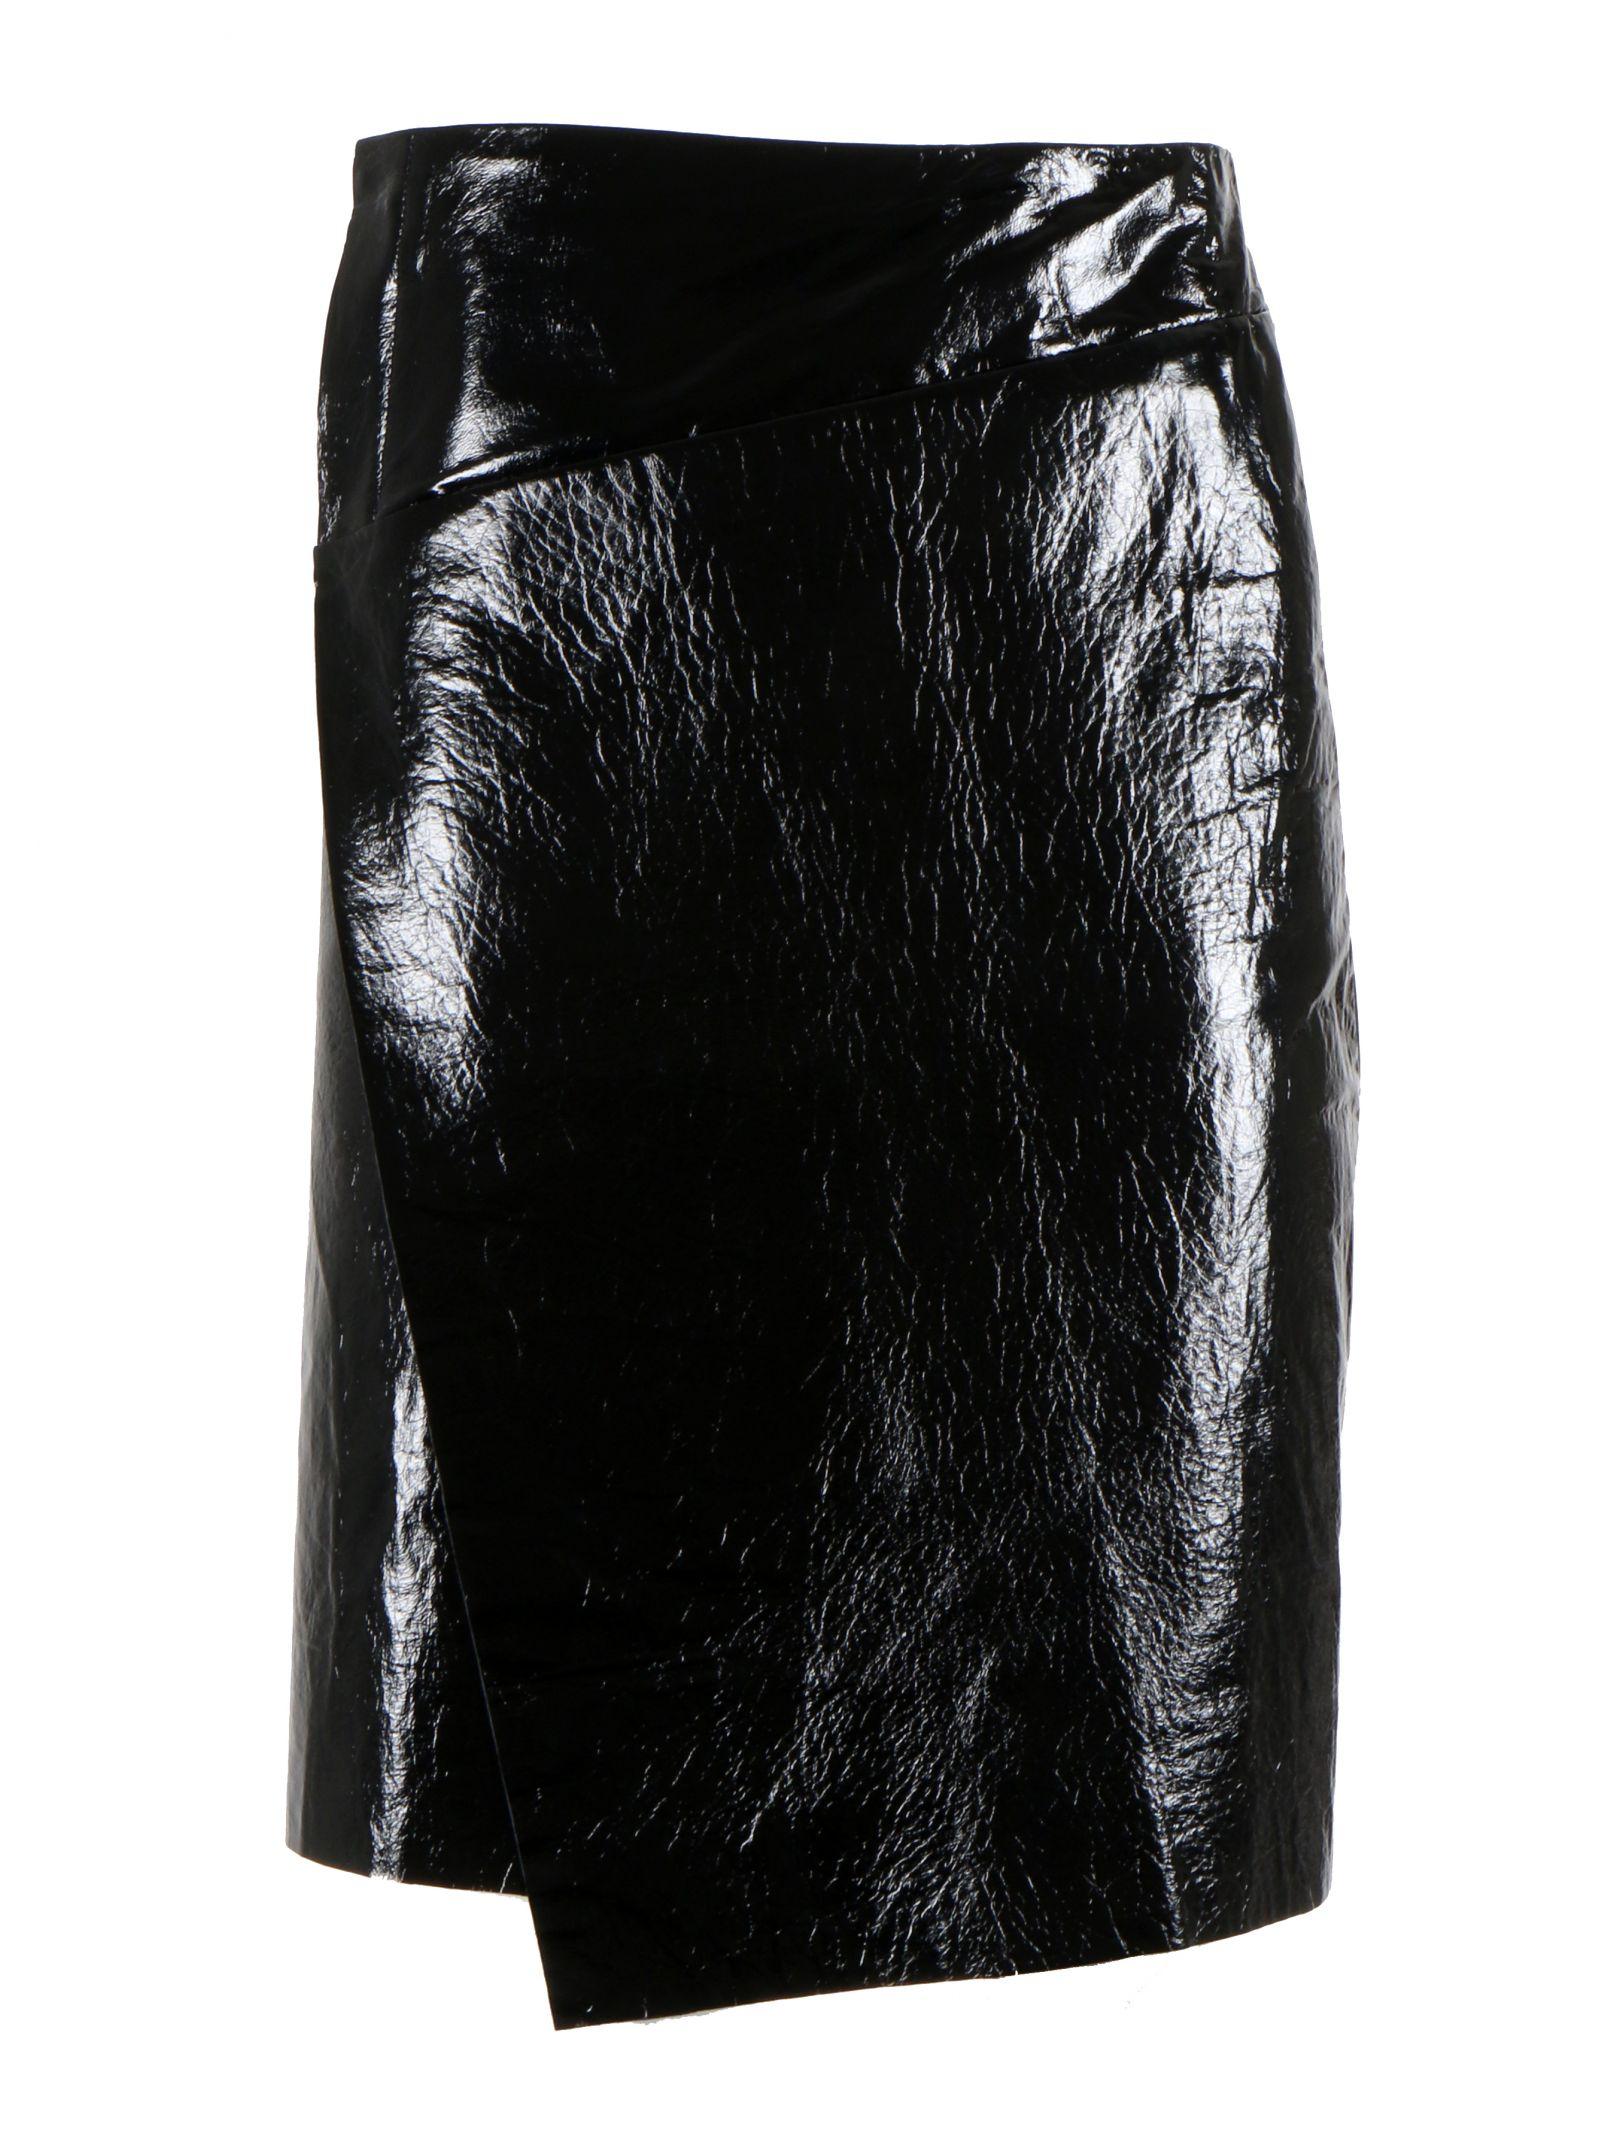 Black skirt from Balenciaga